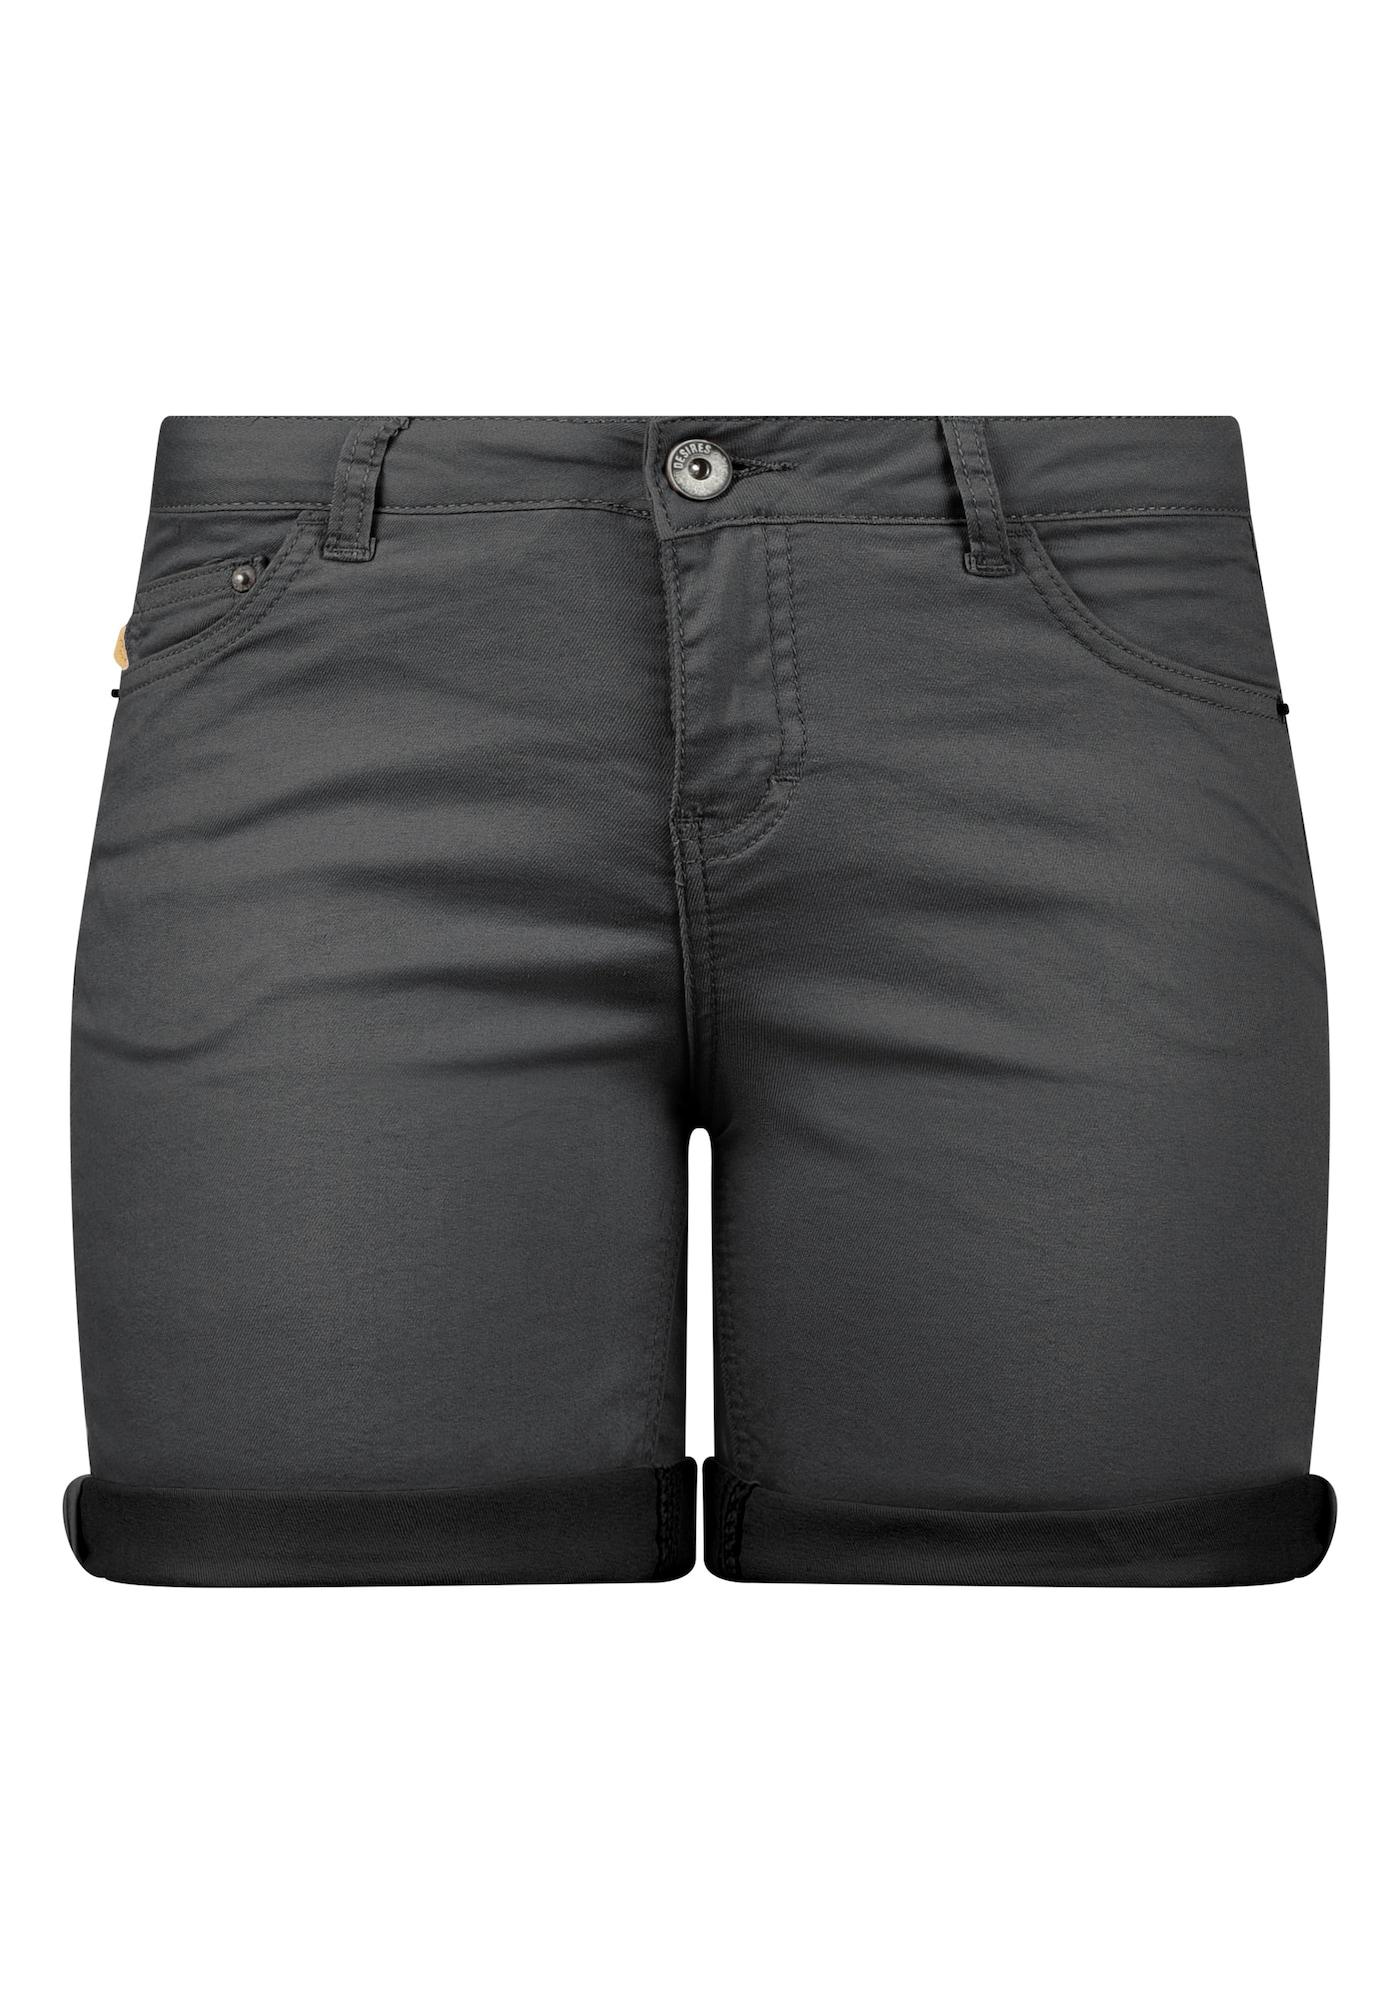 Jeansshorts 'Lila' | Bekleidung > Jeans > Shorts & Bermudas | Dunkelgrau | Desires